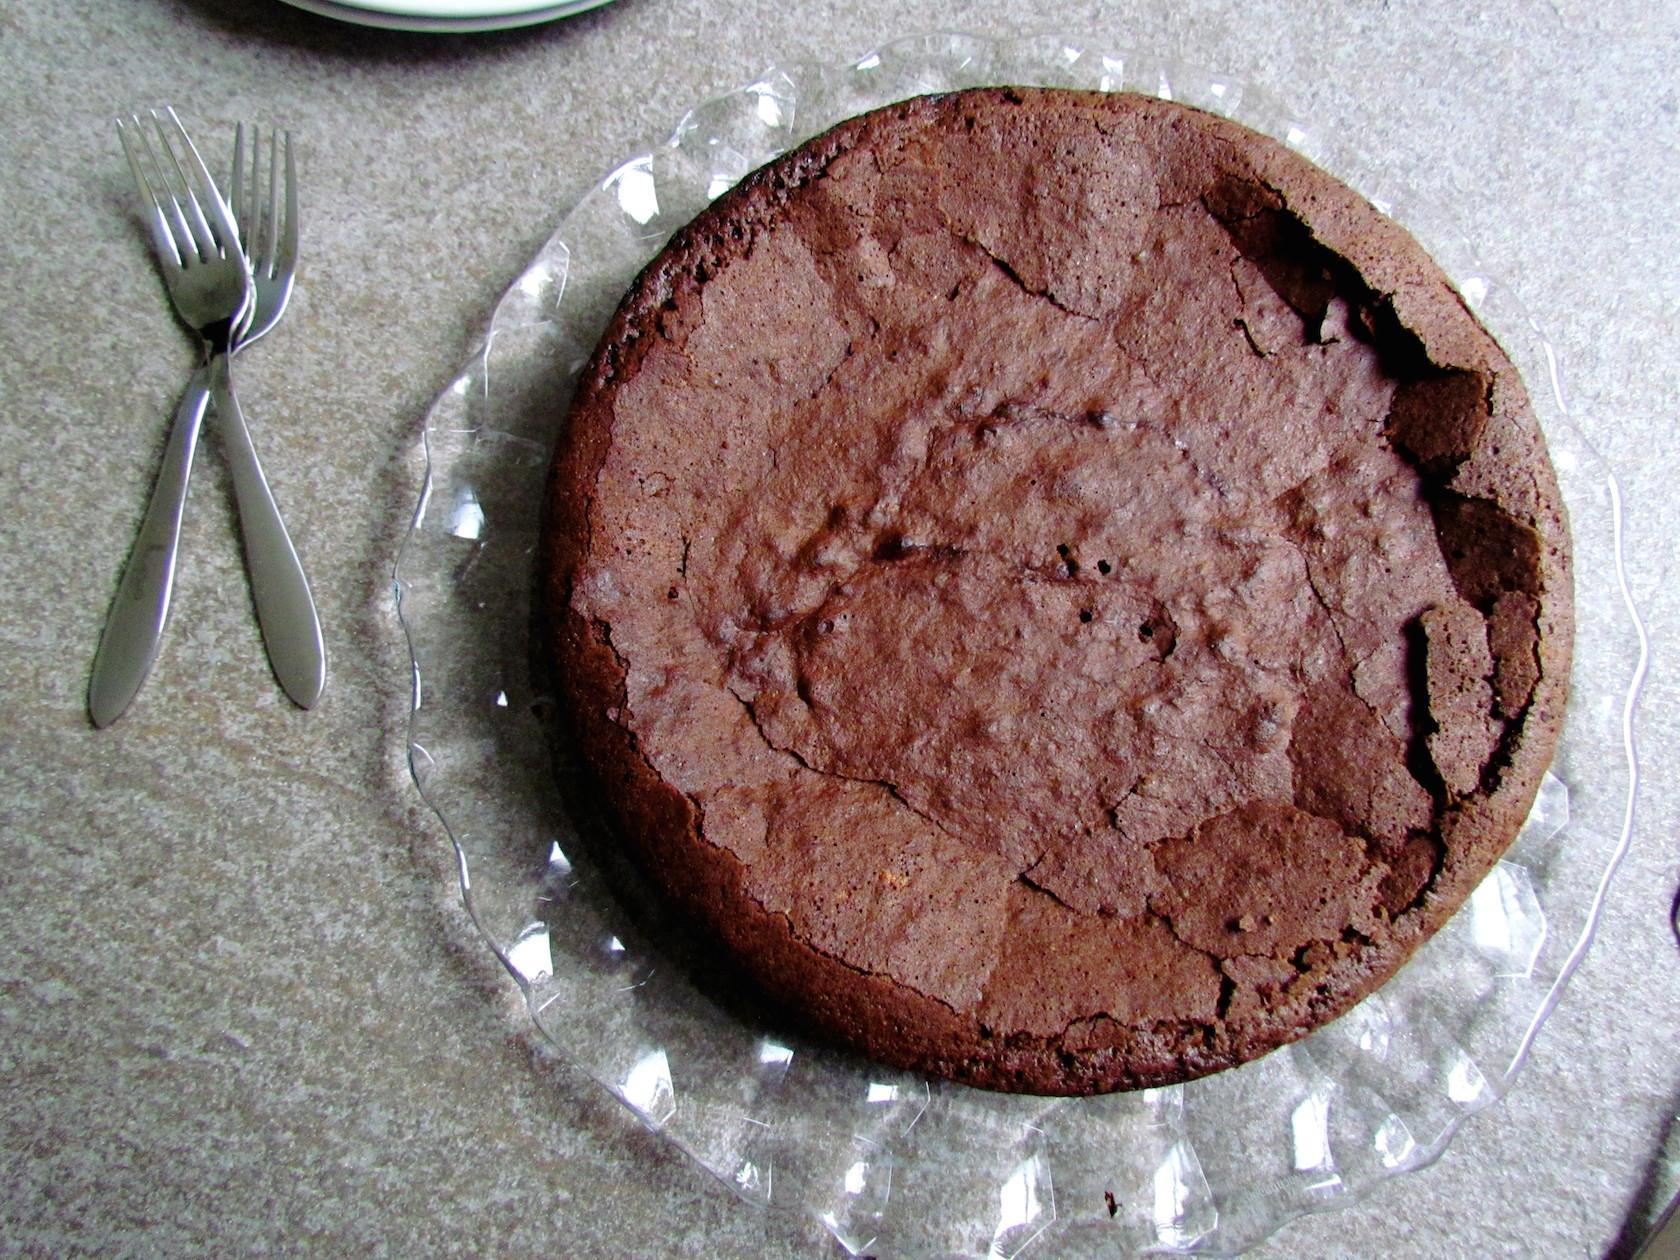 ultra-moist gluten-free chocolate cake – Savormania